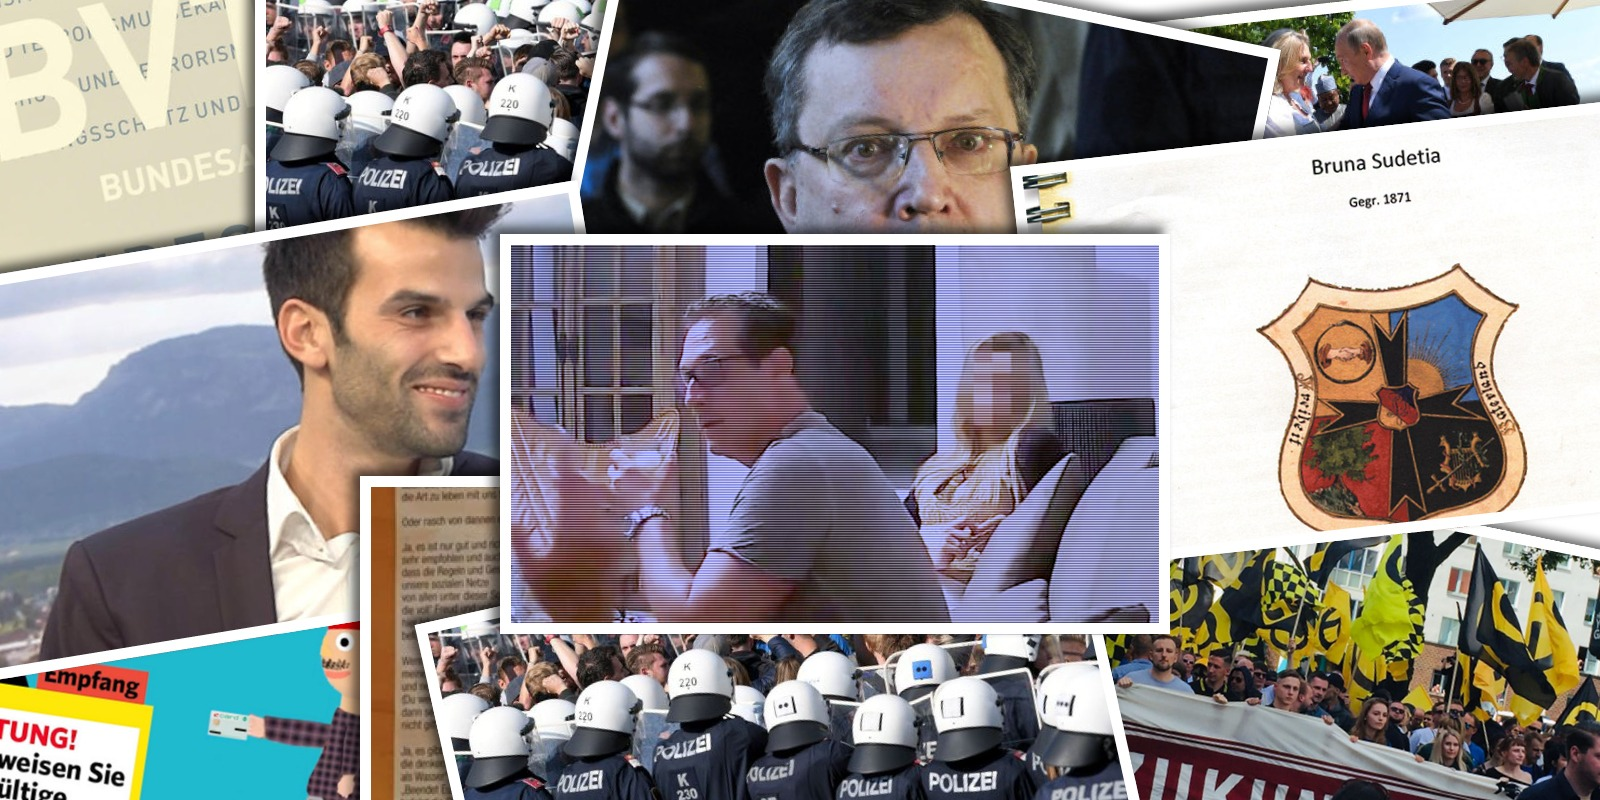 Vor dem Ibiza-Skandal gab es schon